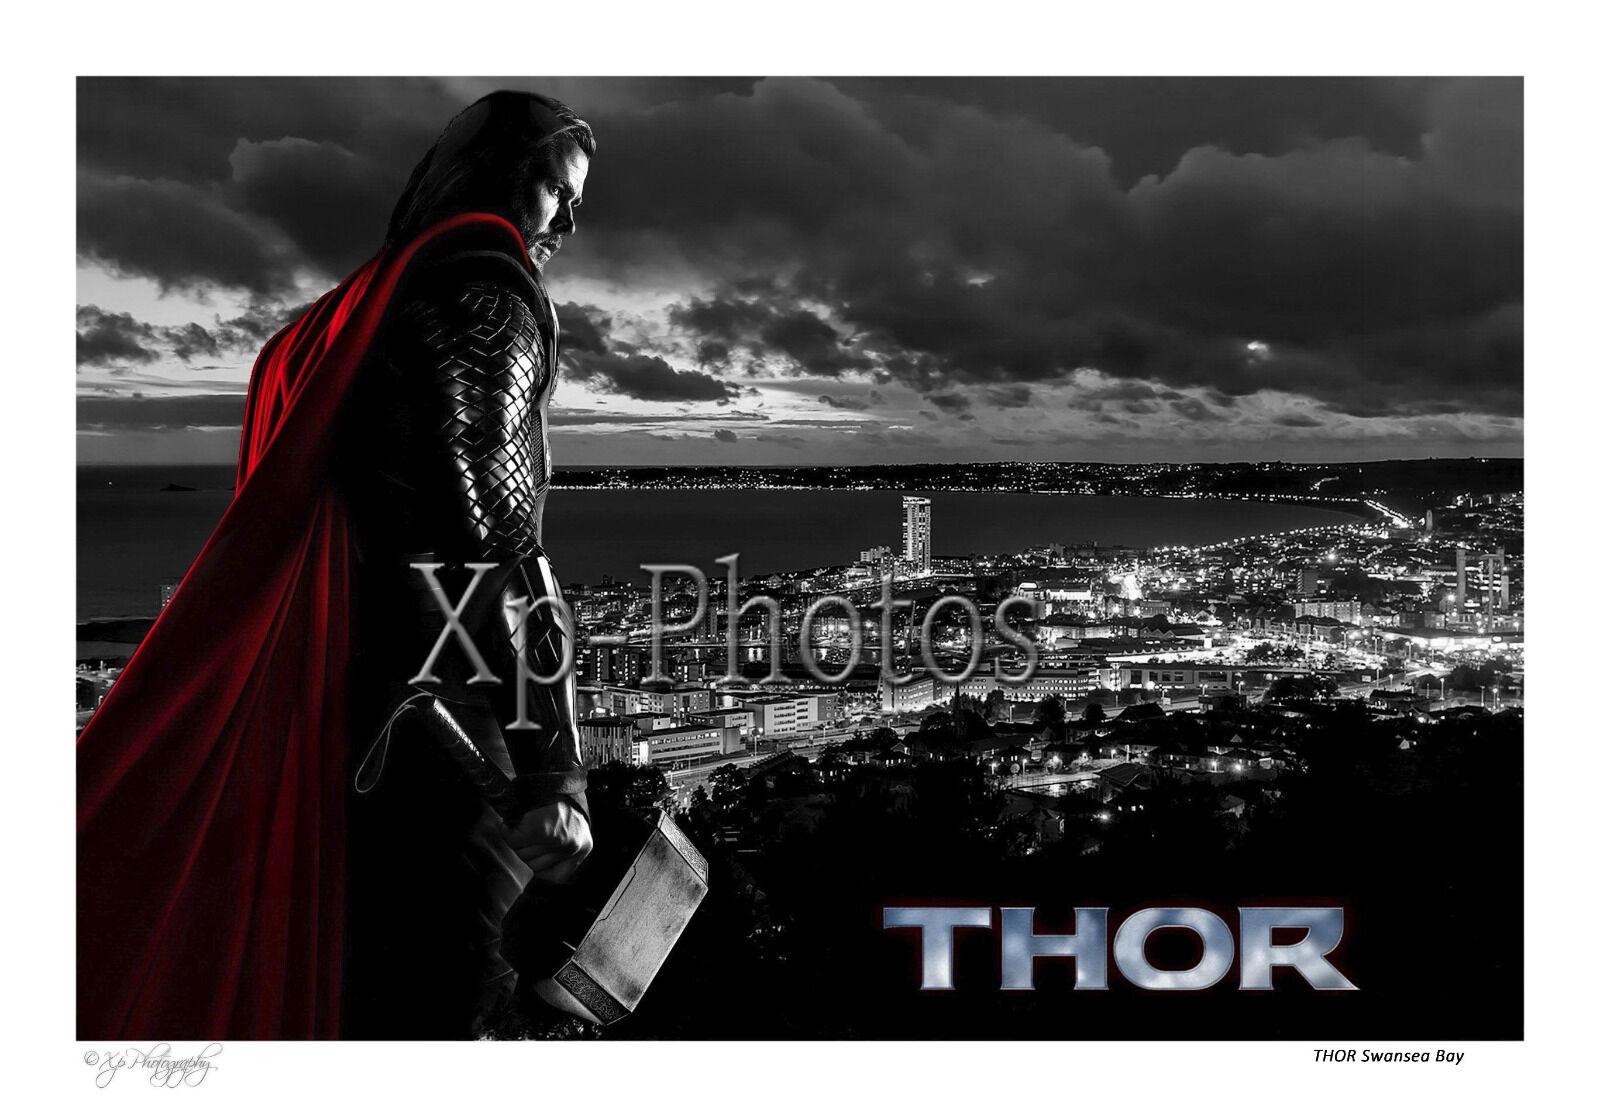 Thor @ Swansea